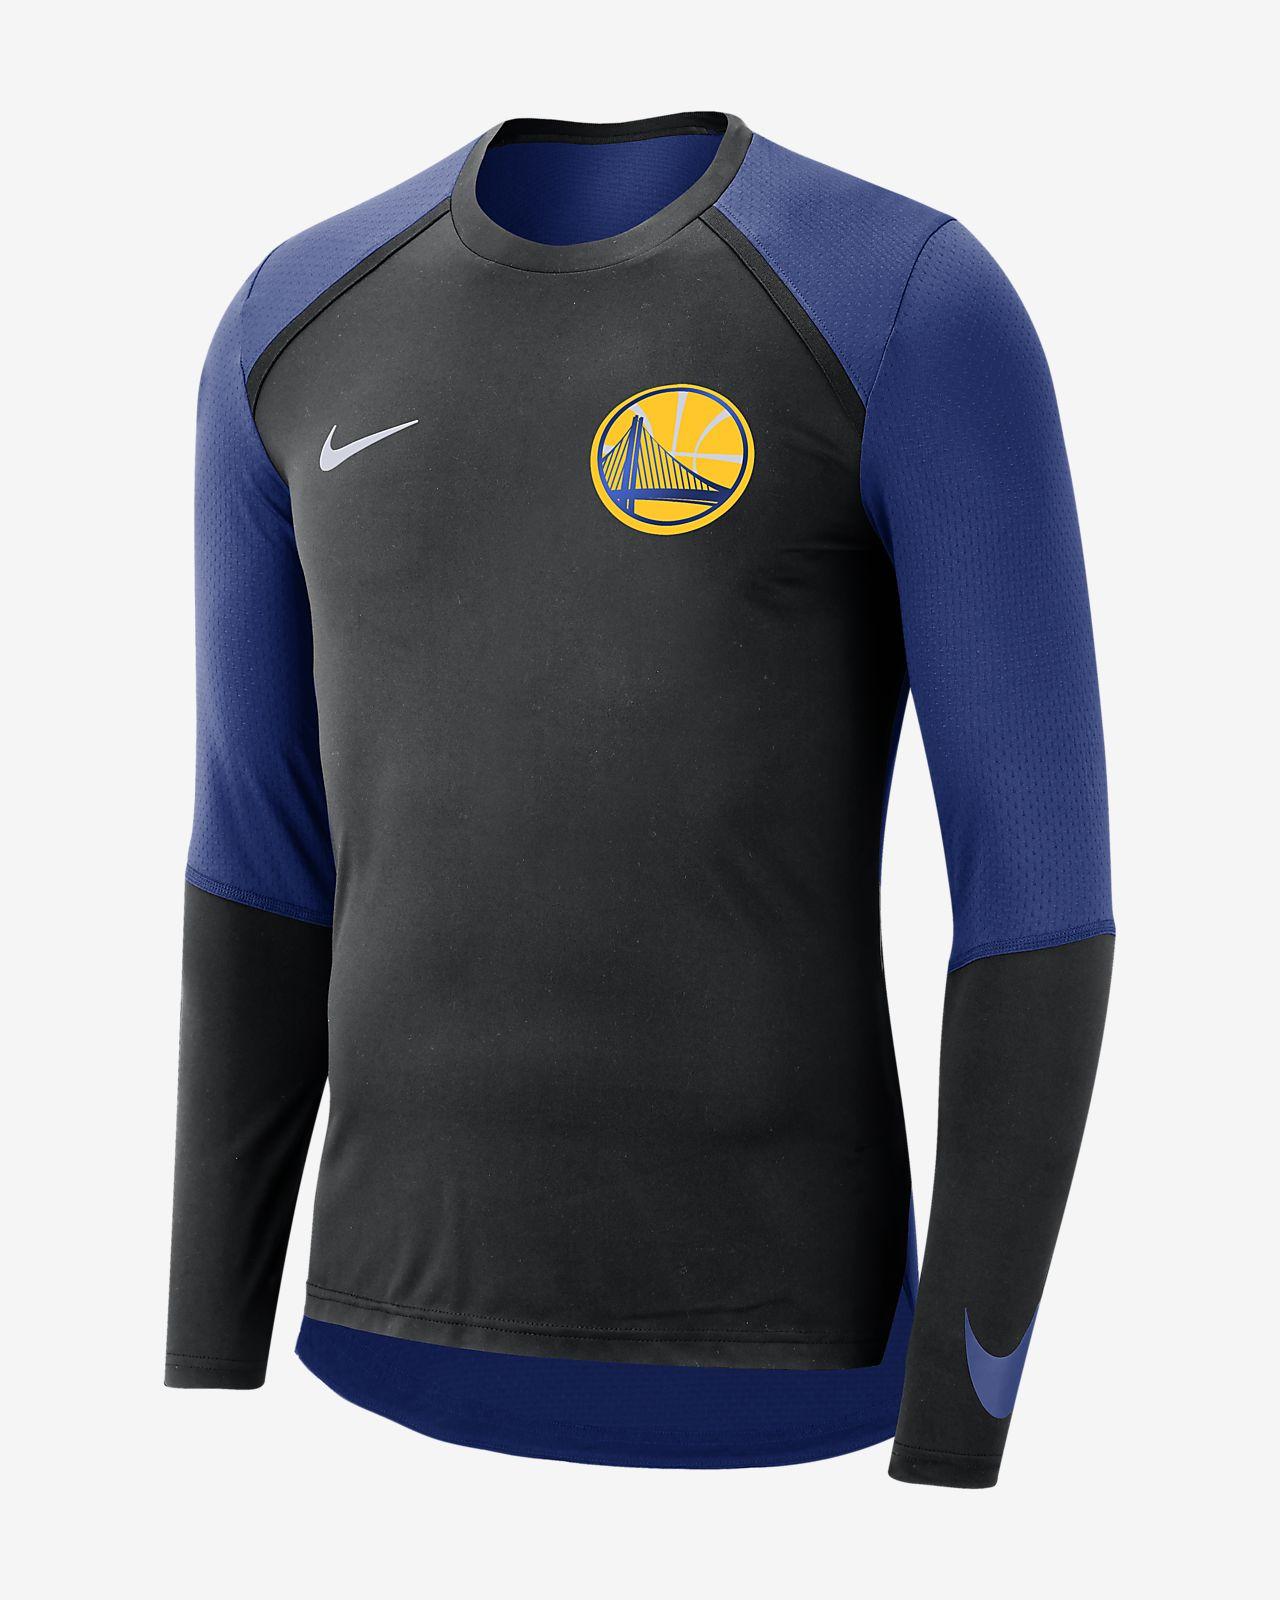 1d49875c Golden State Warriors Nike Dri-FIT Men's Long-Sleeve NBA Top. Nike.com